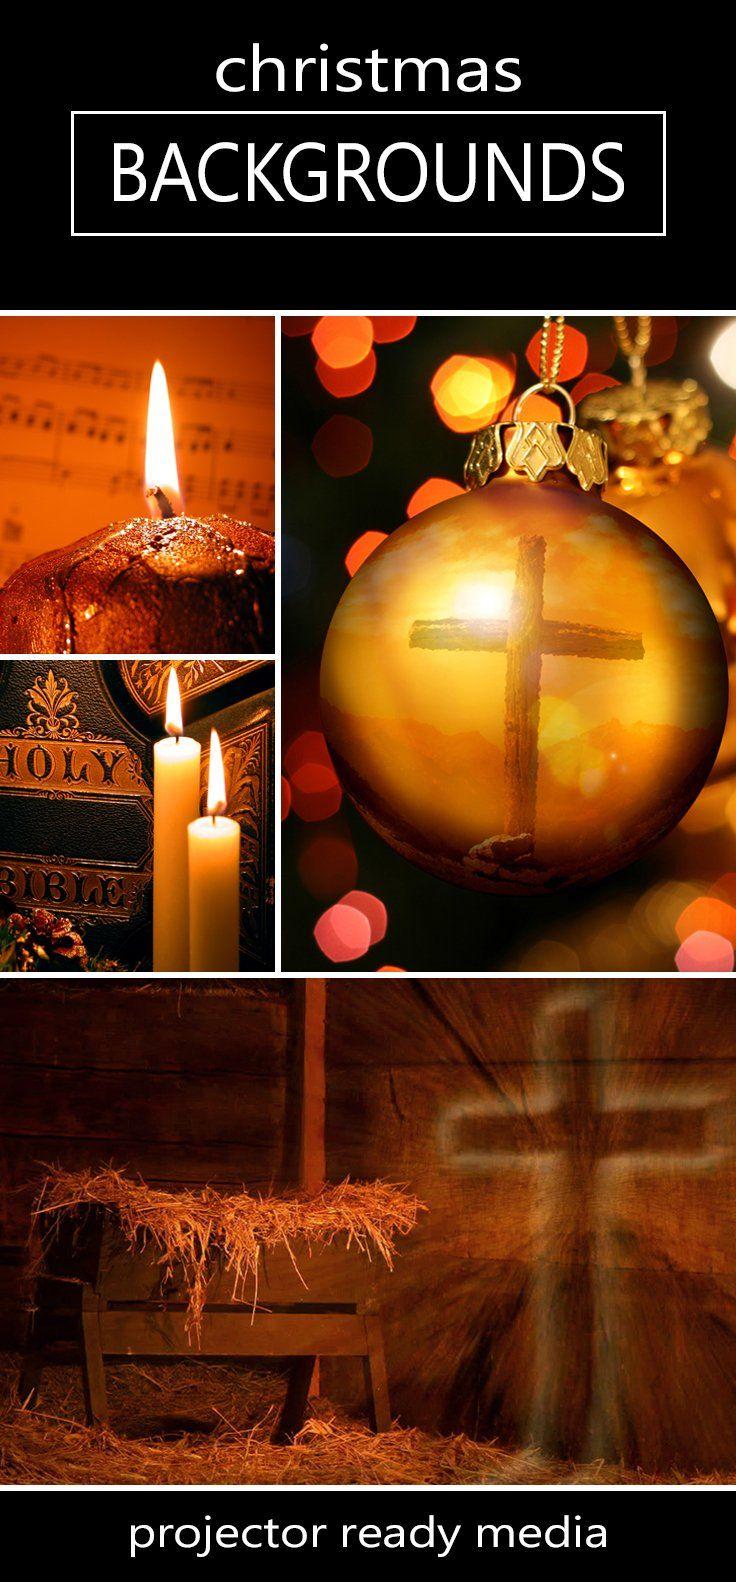 Christmas Backgrounds - Projector Ready Christmas Media | ImageVine